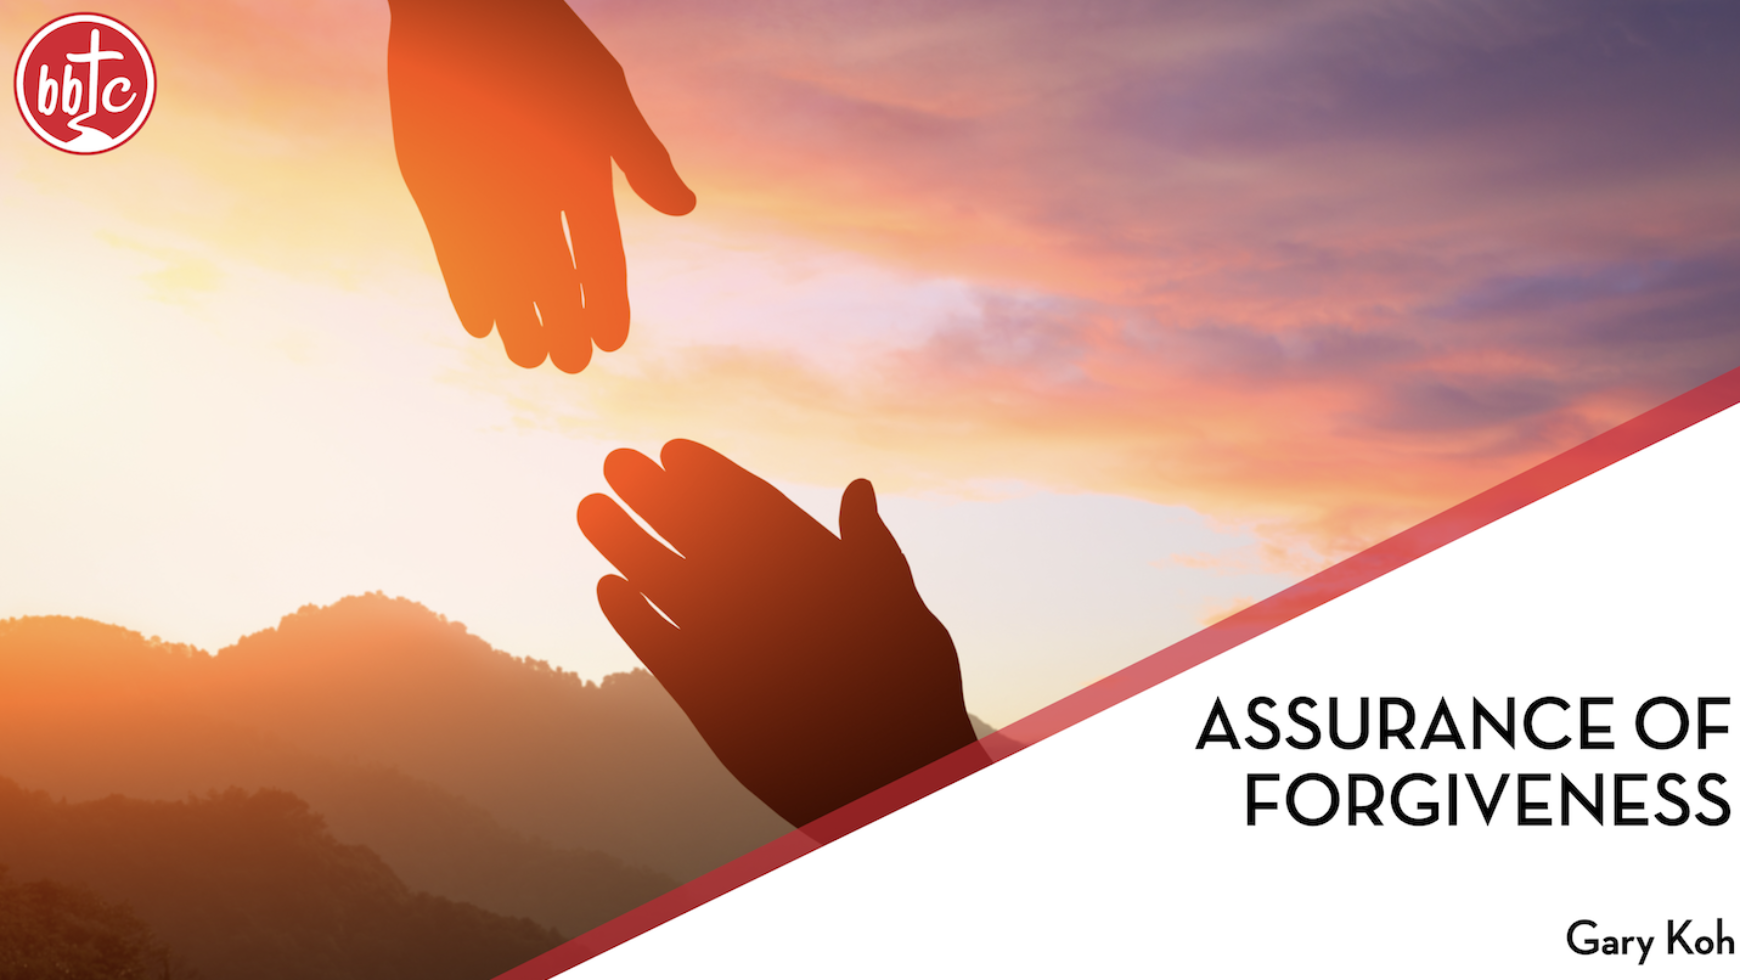 Assurance of Forgiveness